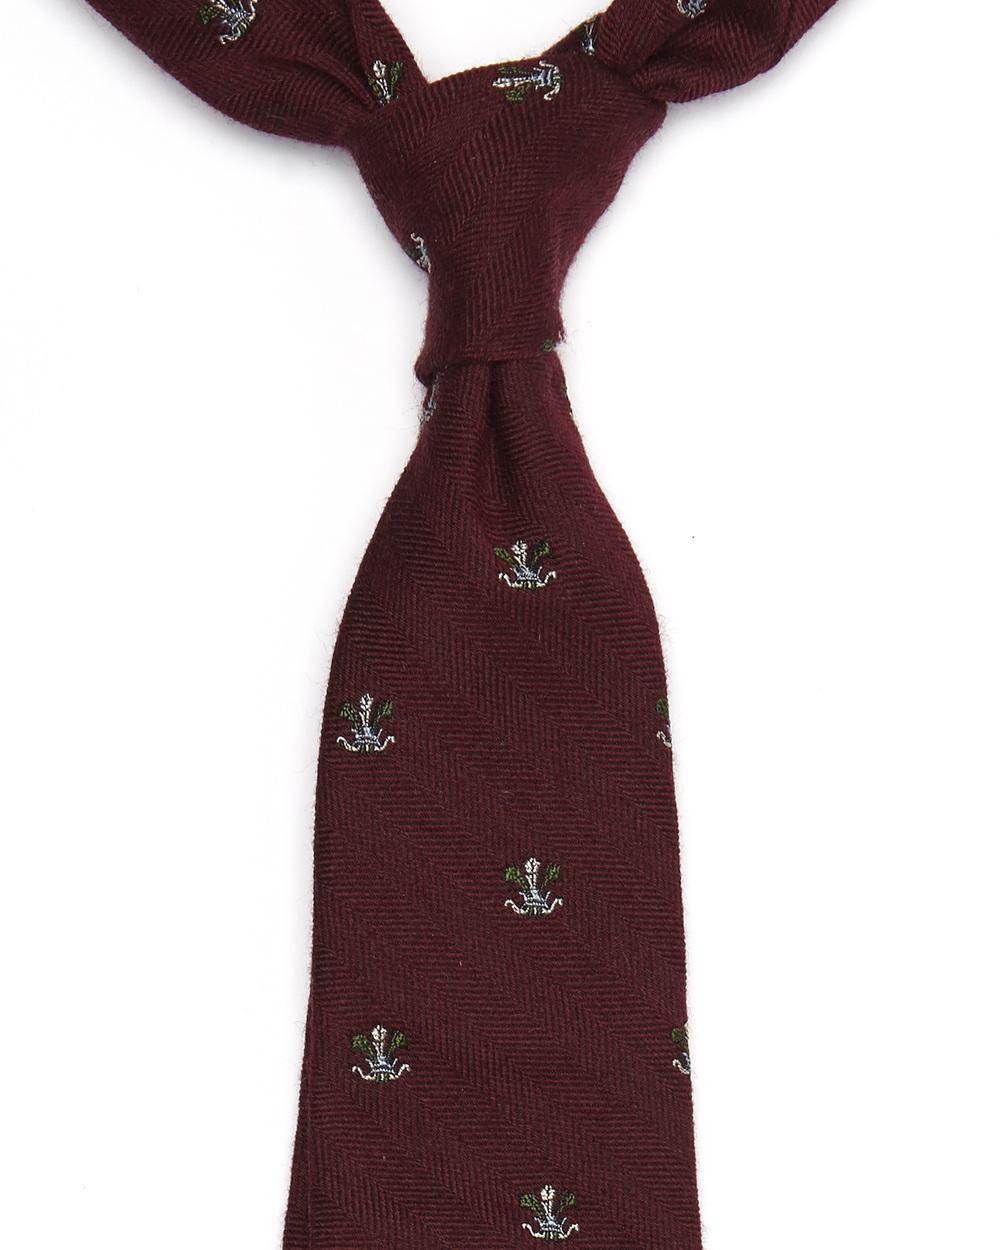 Harold Tie| Wool & Silk Crest Pattern | 5ExclusiveHandMade Ties Available- £98.00